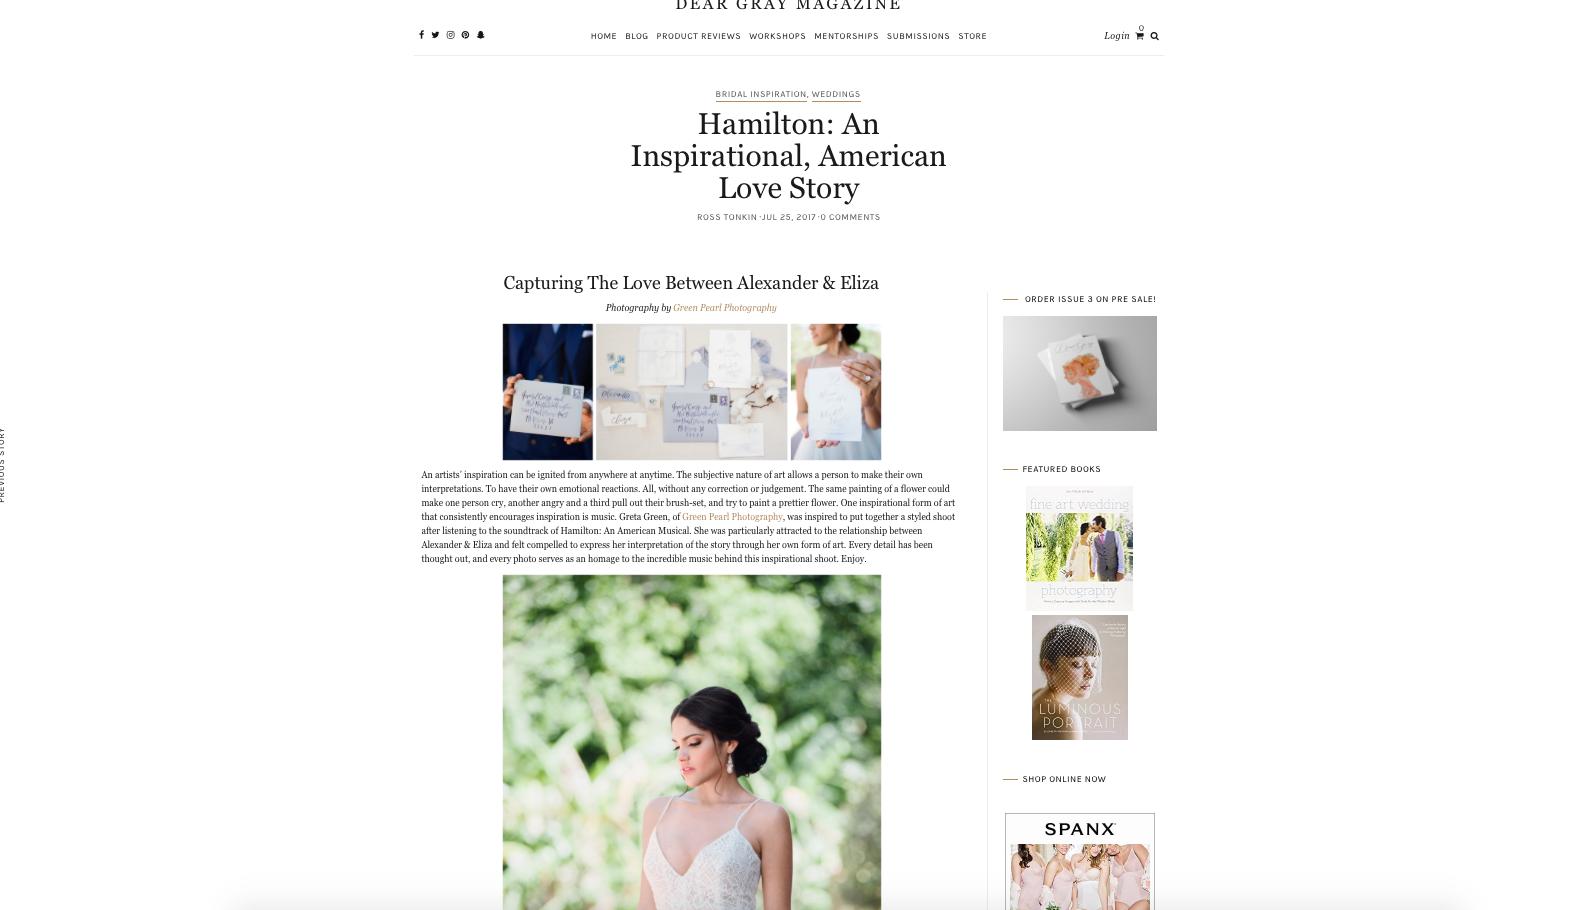 Edera designs featured on Dear Gray Magazine